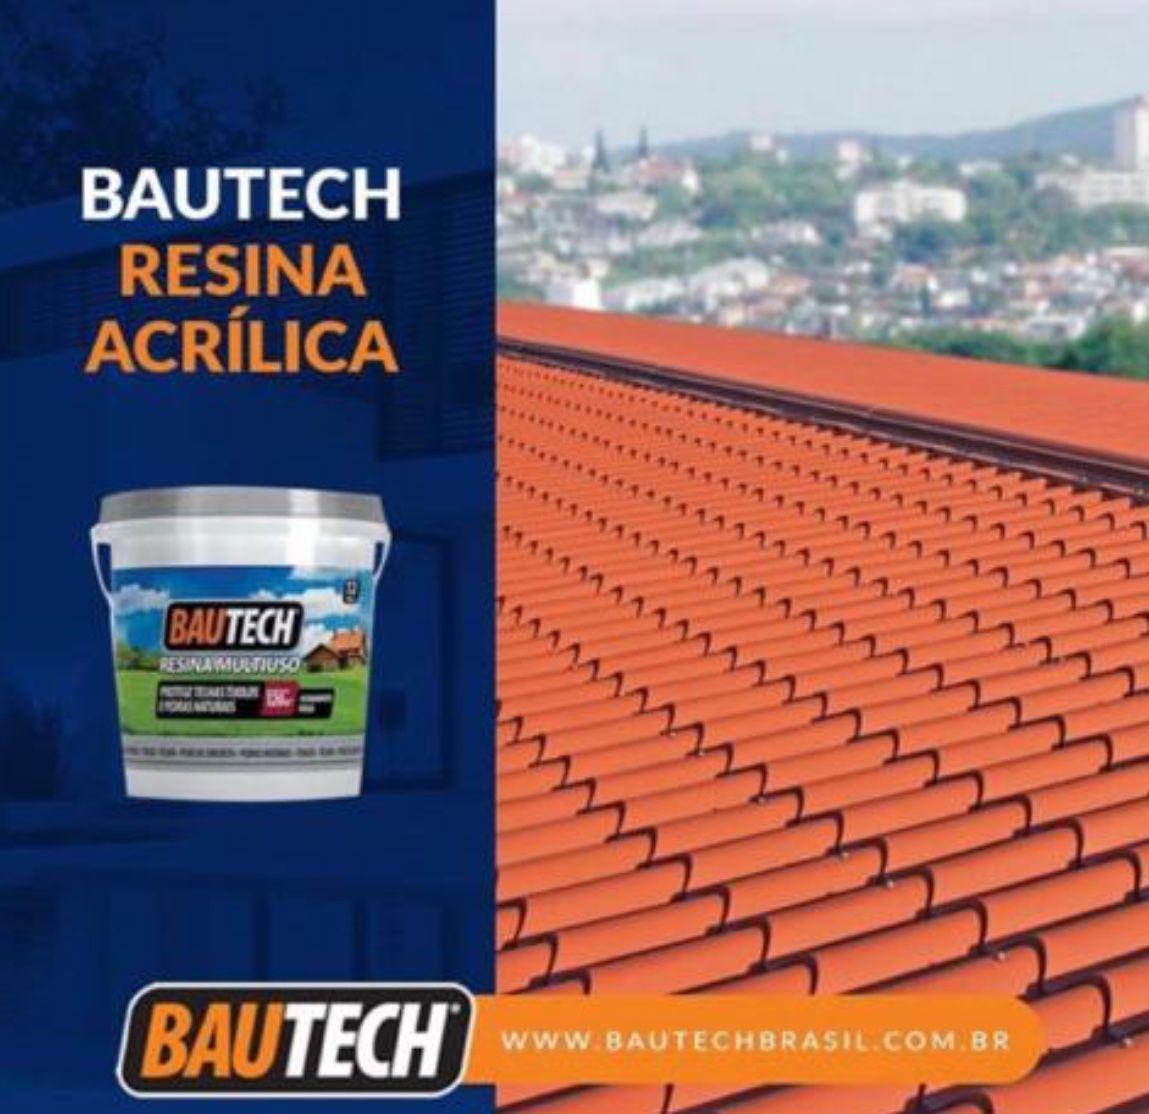 Bautech Resina Acrílica Multiuso 3,6l - Brilho Incolor